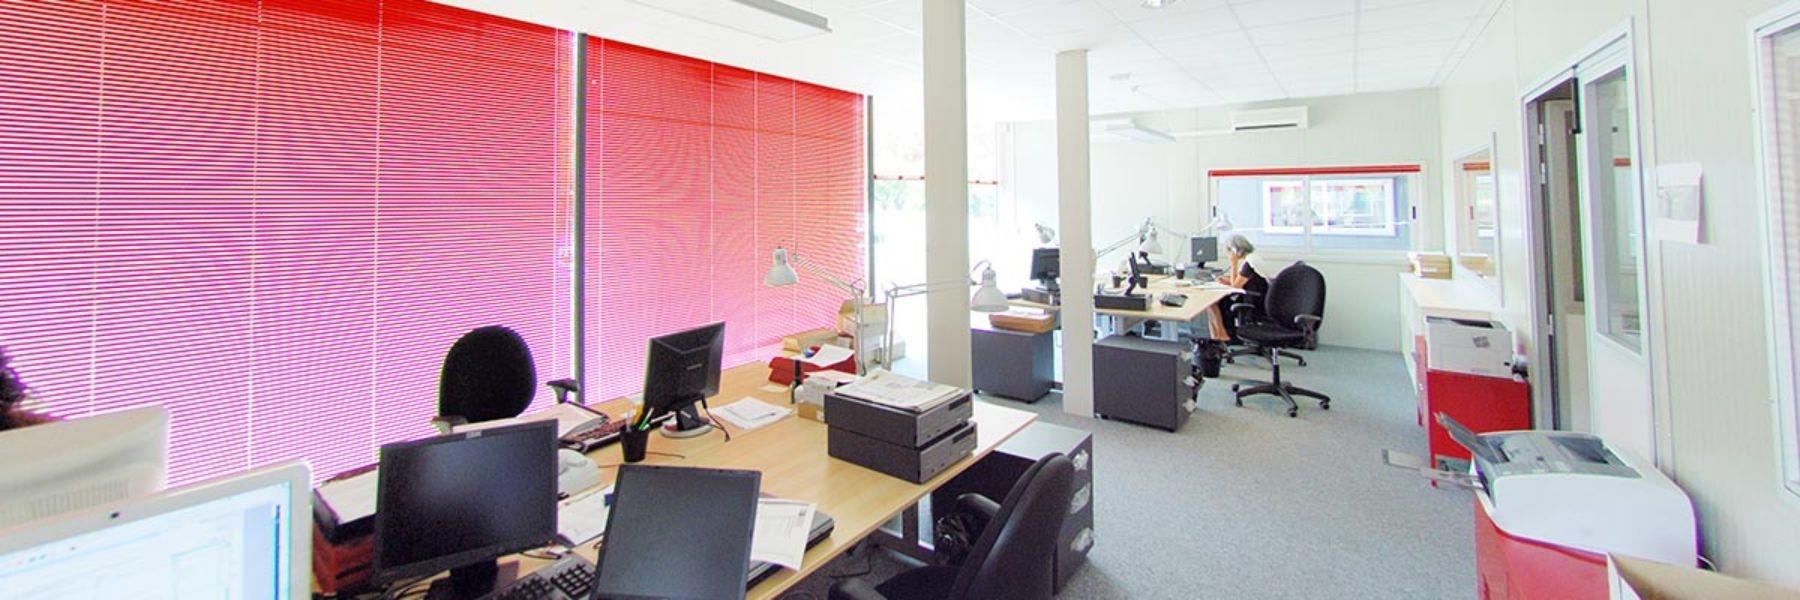 UFFICI | uffici 02(1)